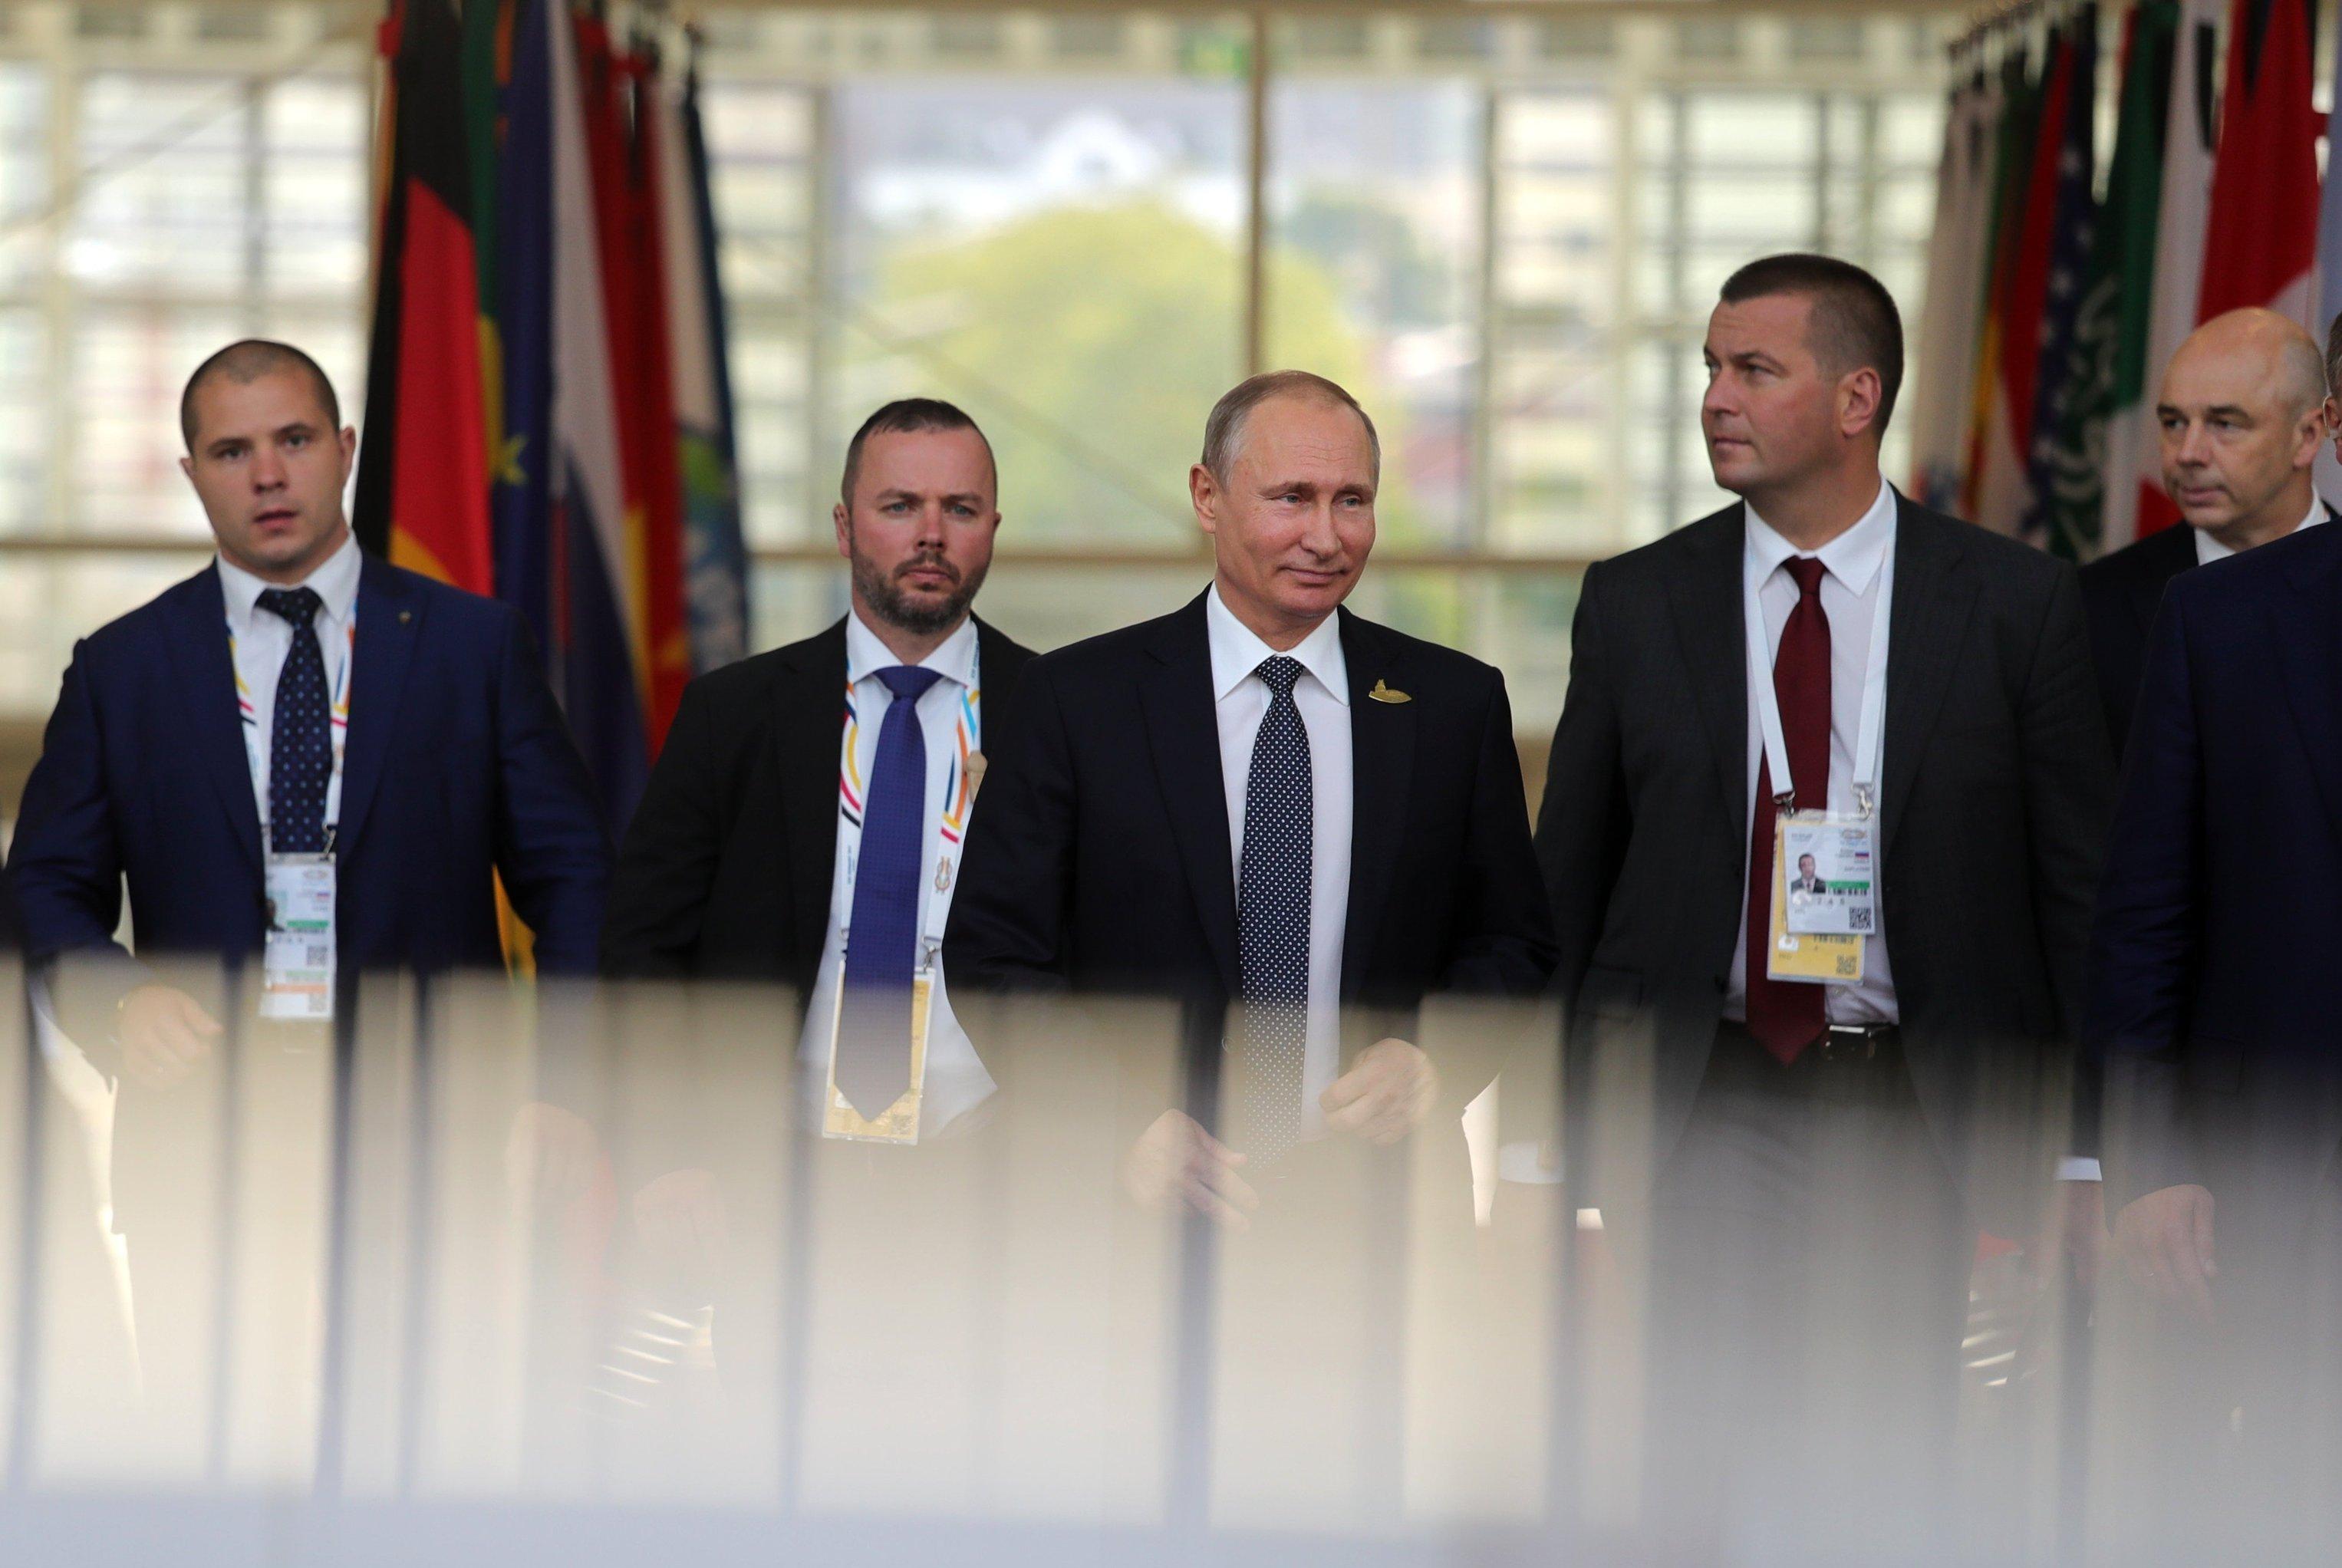 President Vladimir Putin attends G20 summit in Hamburg, July 2017